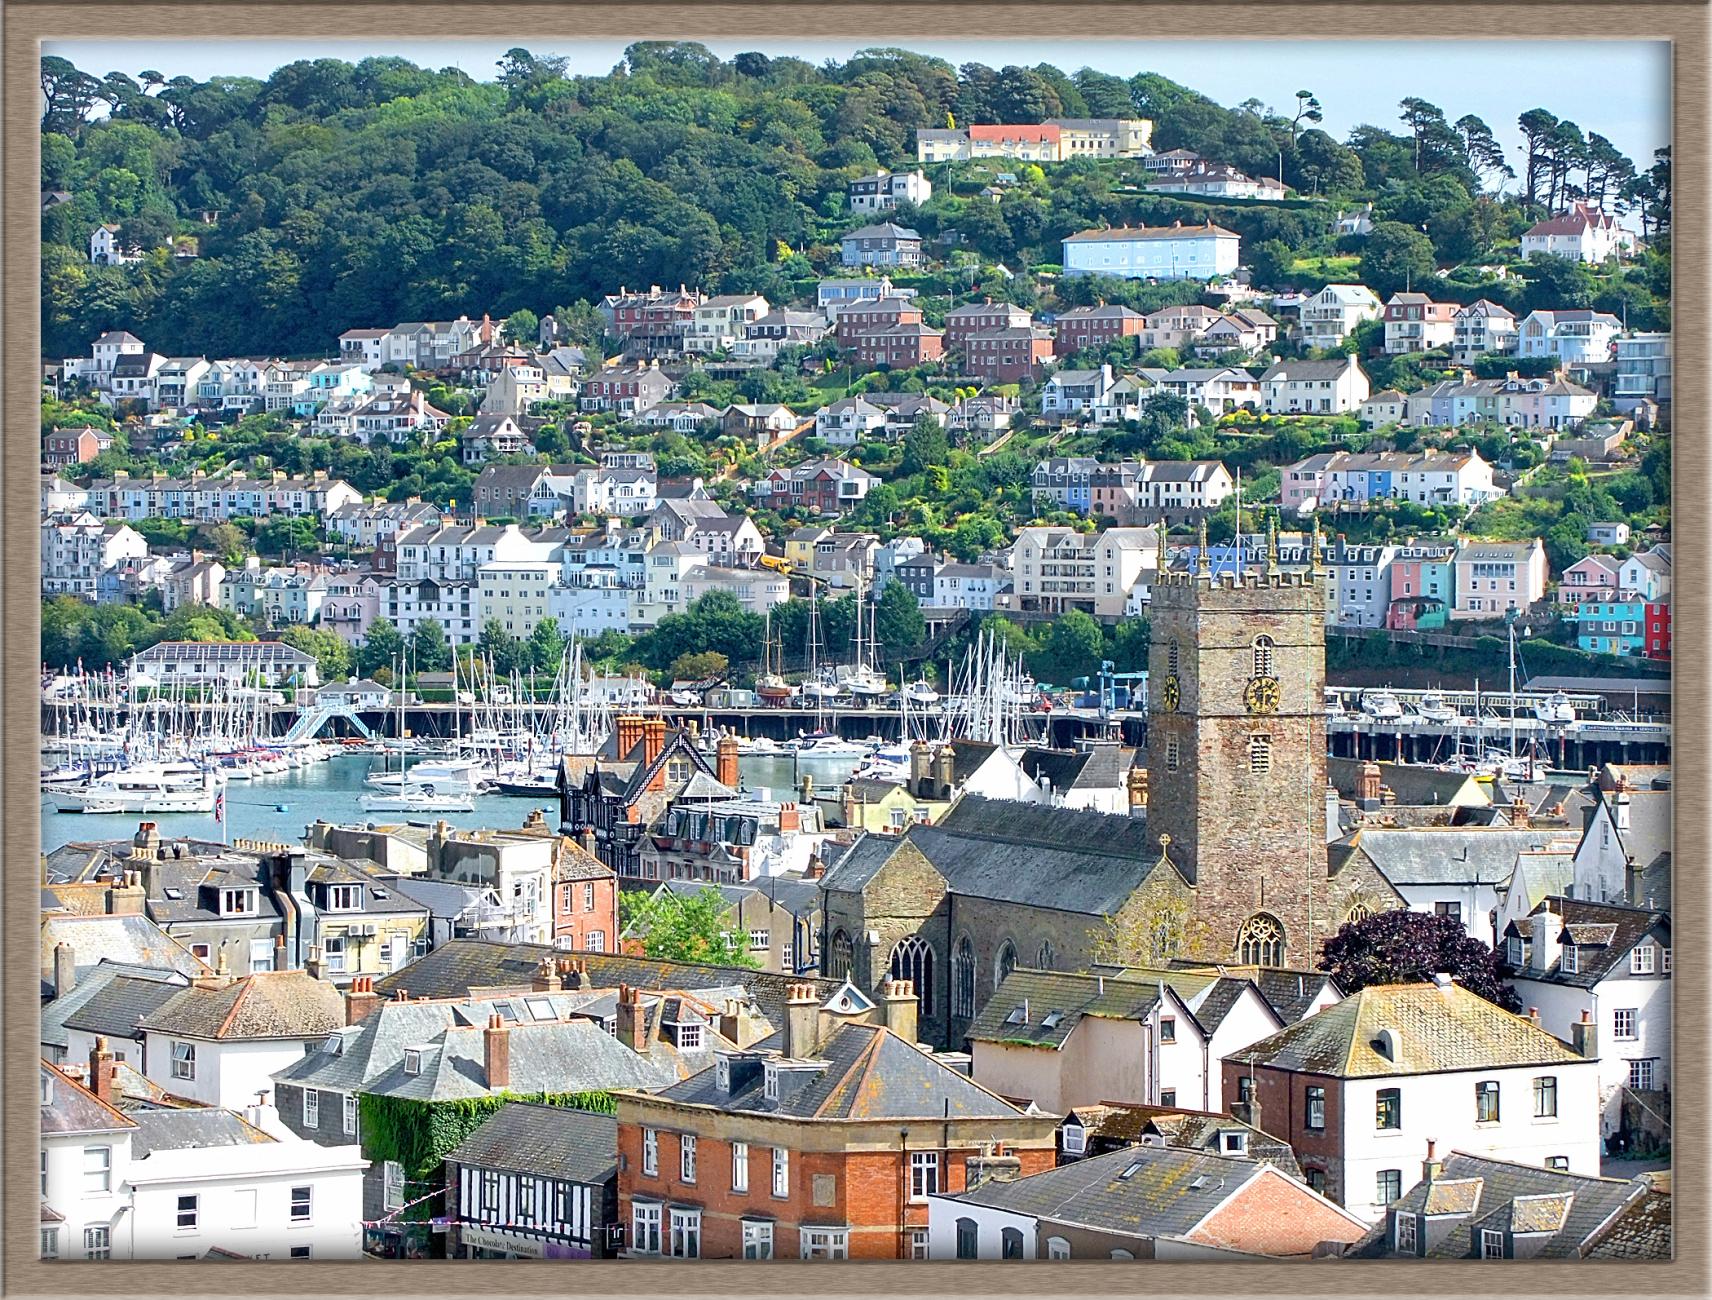 Dartmouth and Kingswear